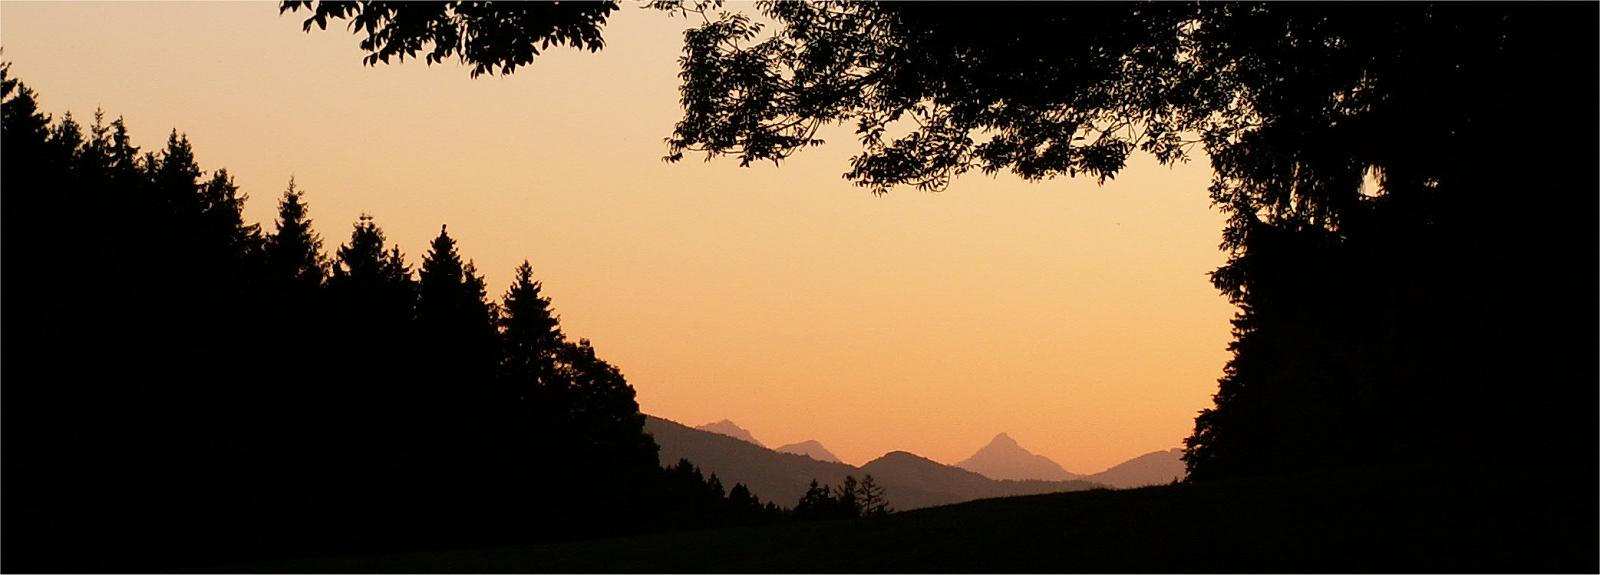 Aften ved Lechbruck